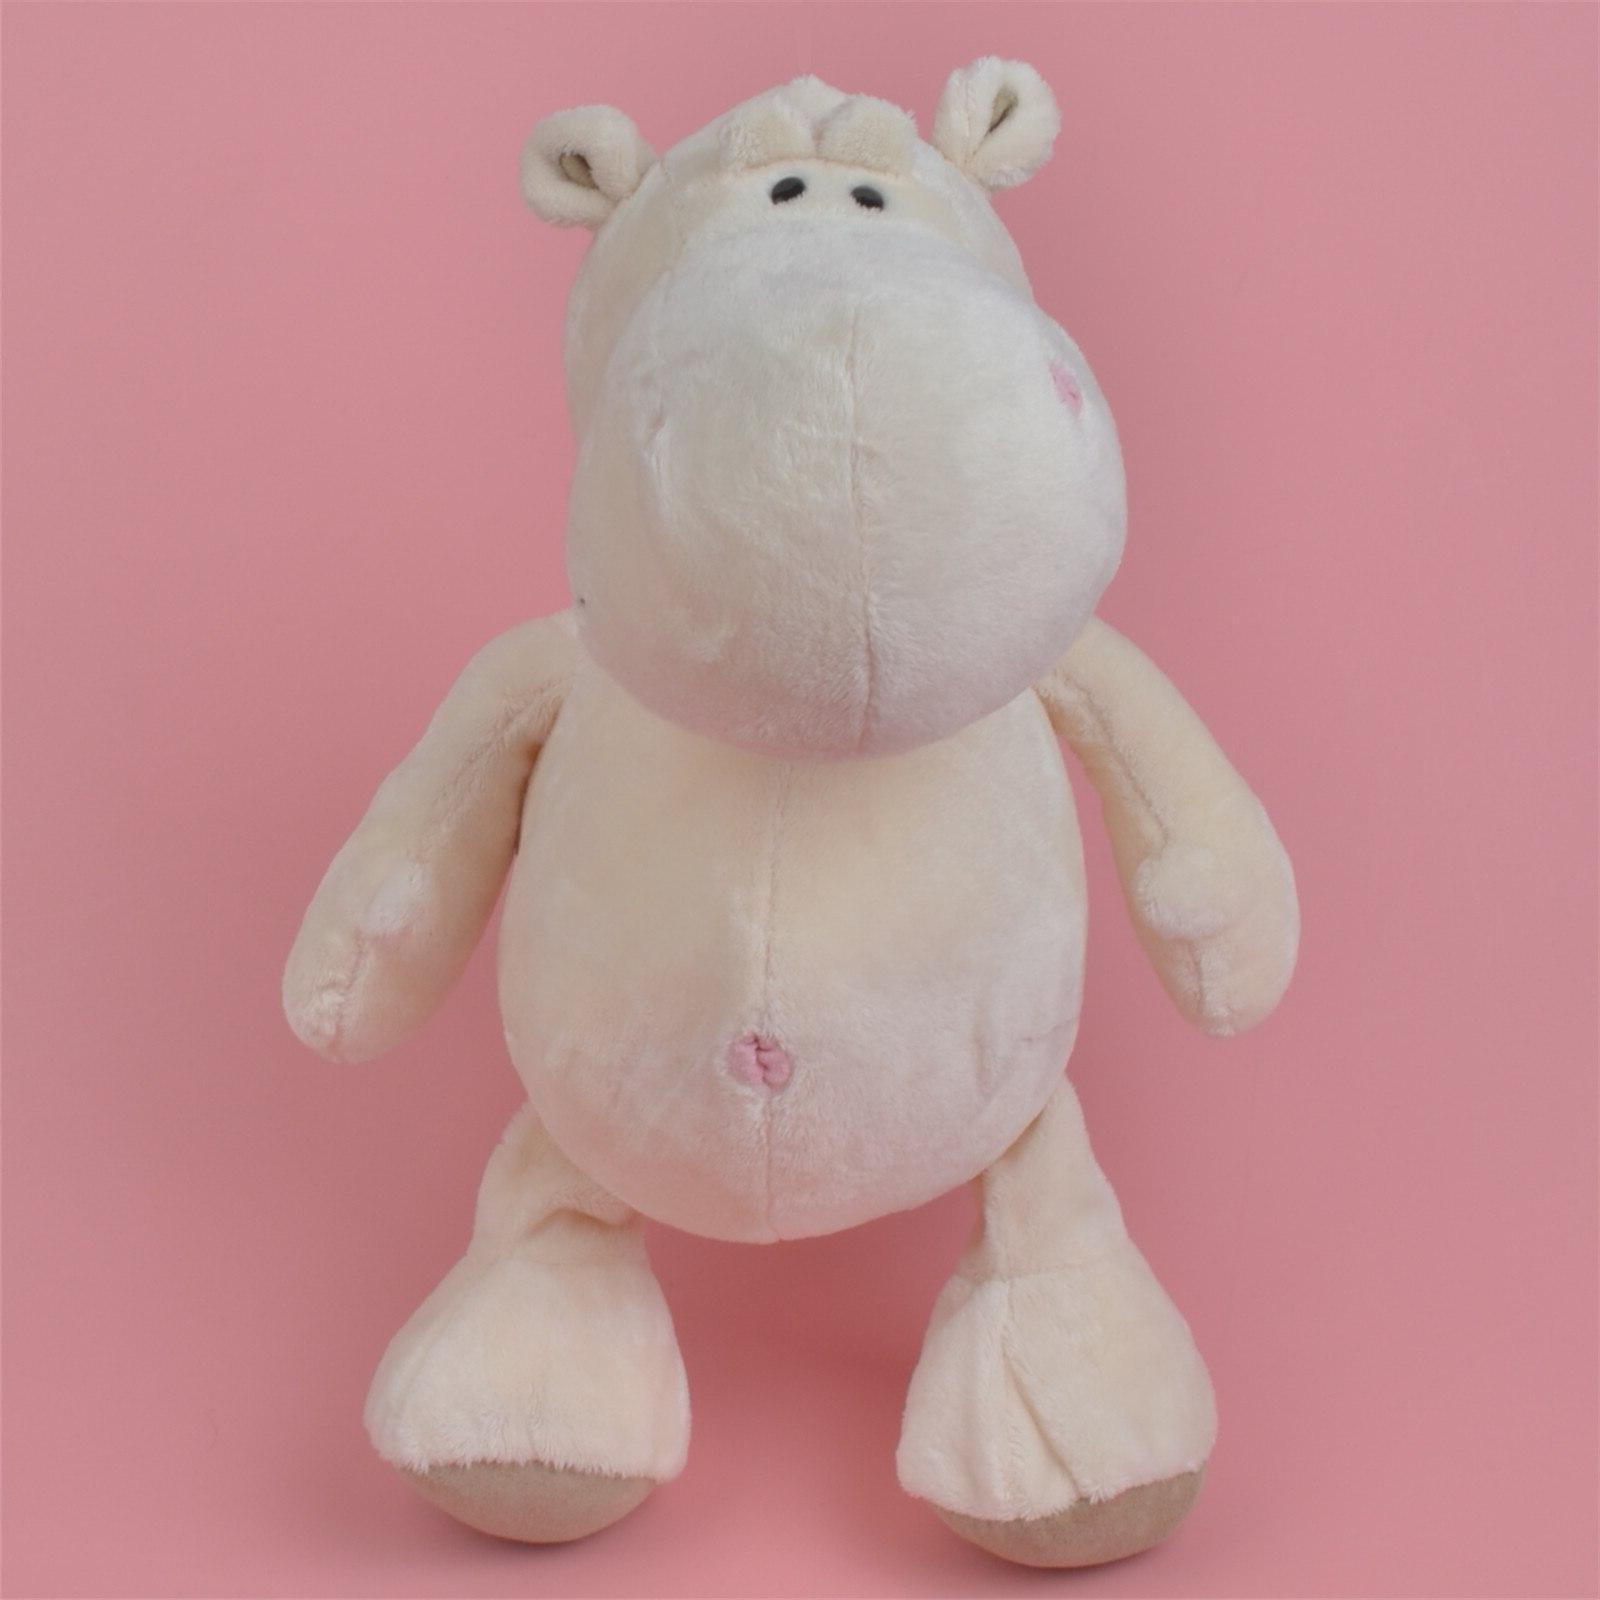 25 cm- 40 White <font><b>zoo</b></font> jungle <font><b>Stuffed</b></font> Plush Kids Doll Shipping